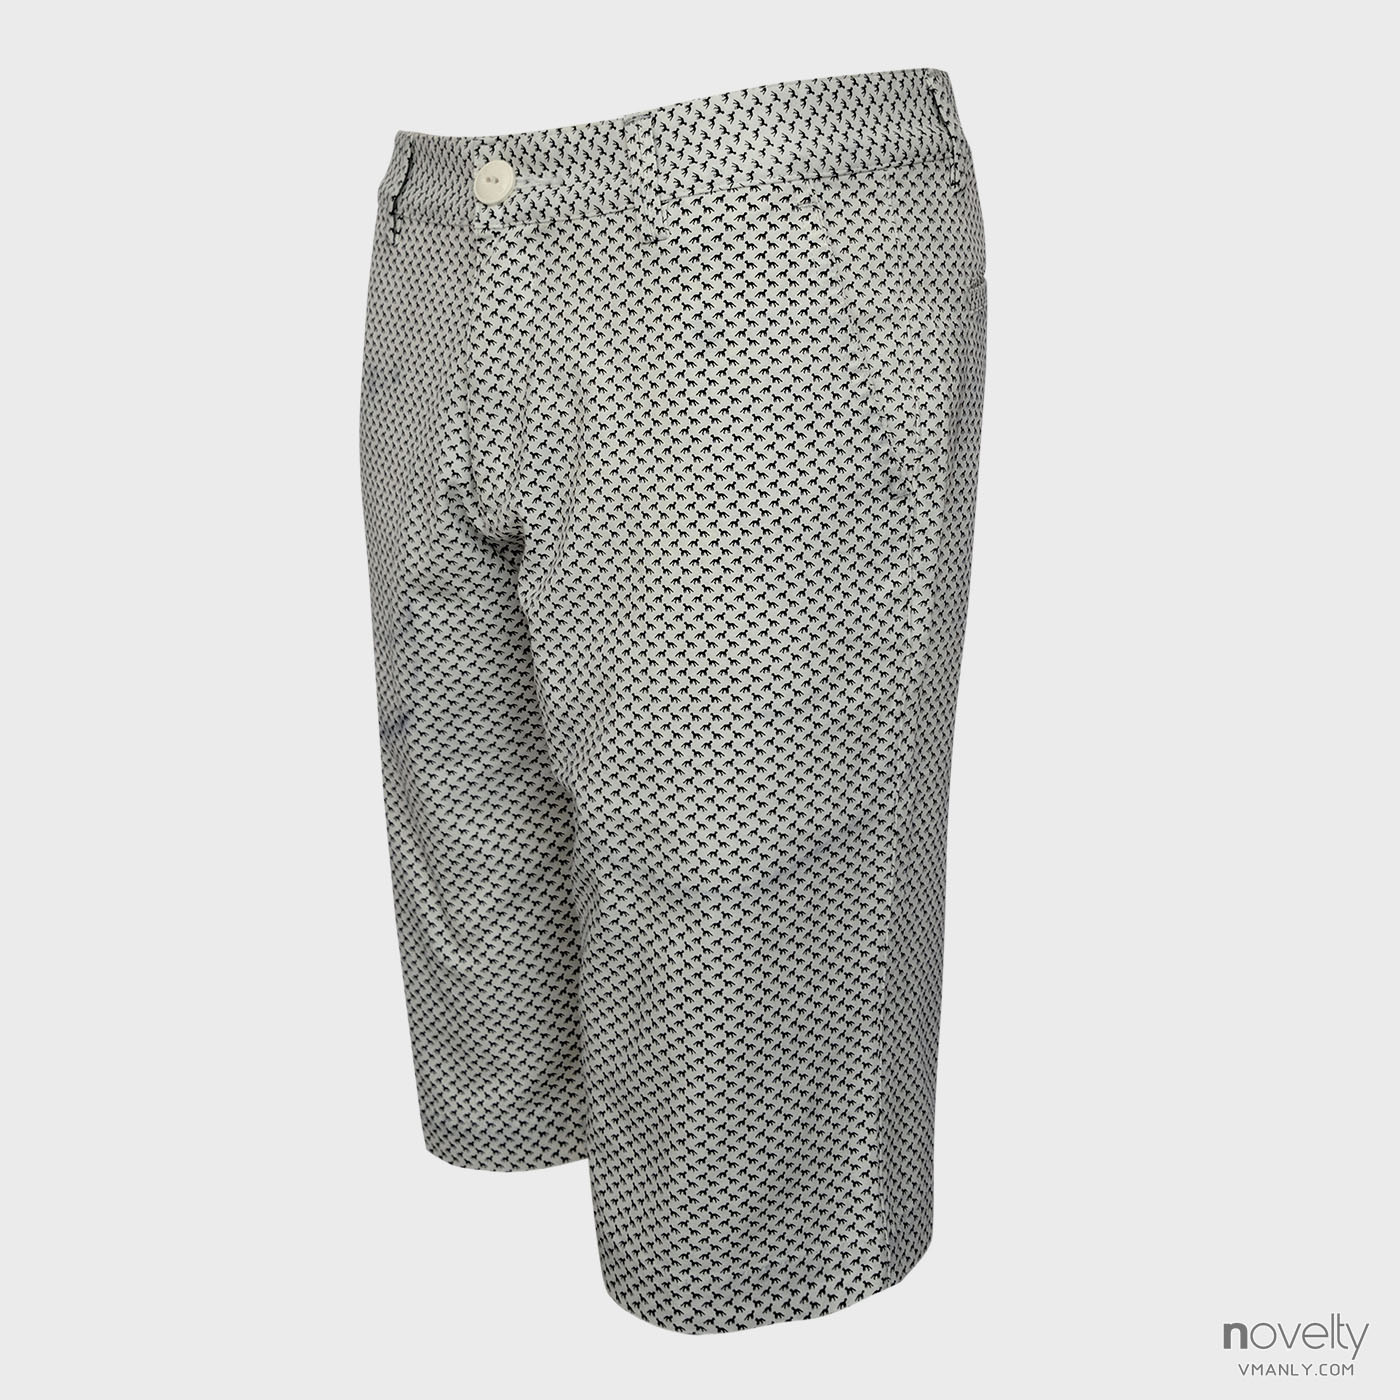 Quần short kaki nam Novelty màu trắng hoa văn NSKMINNCSR162022